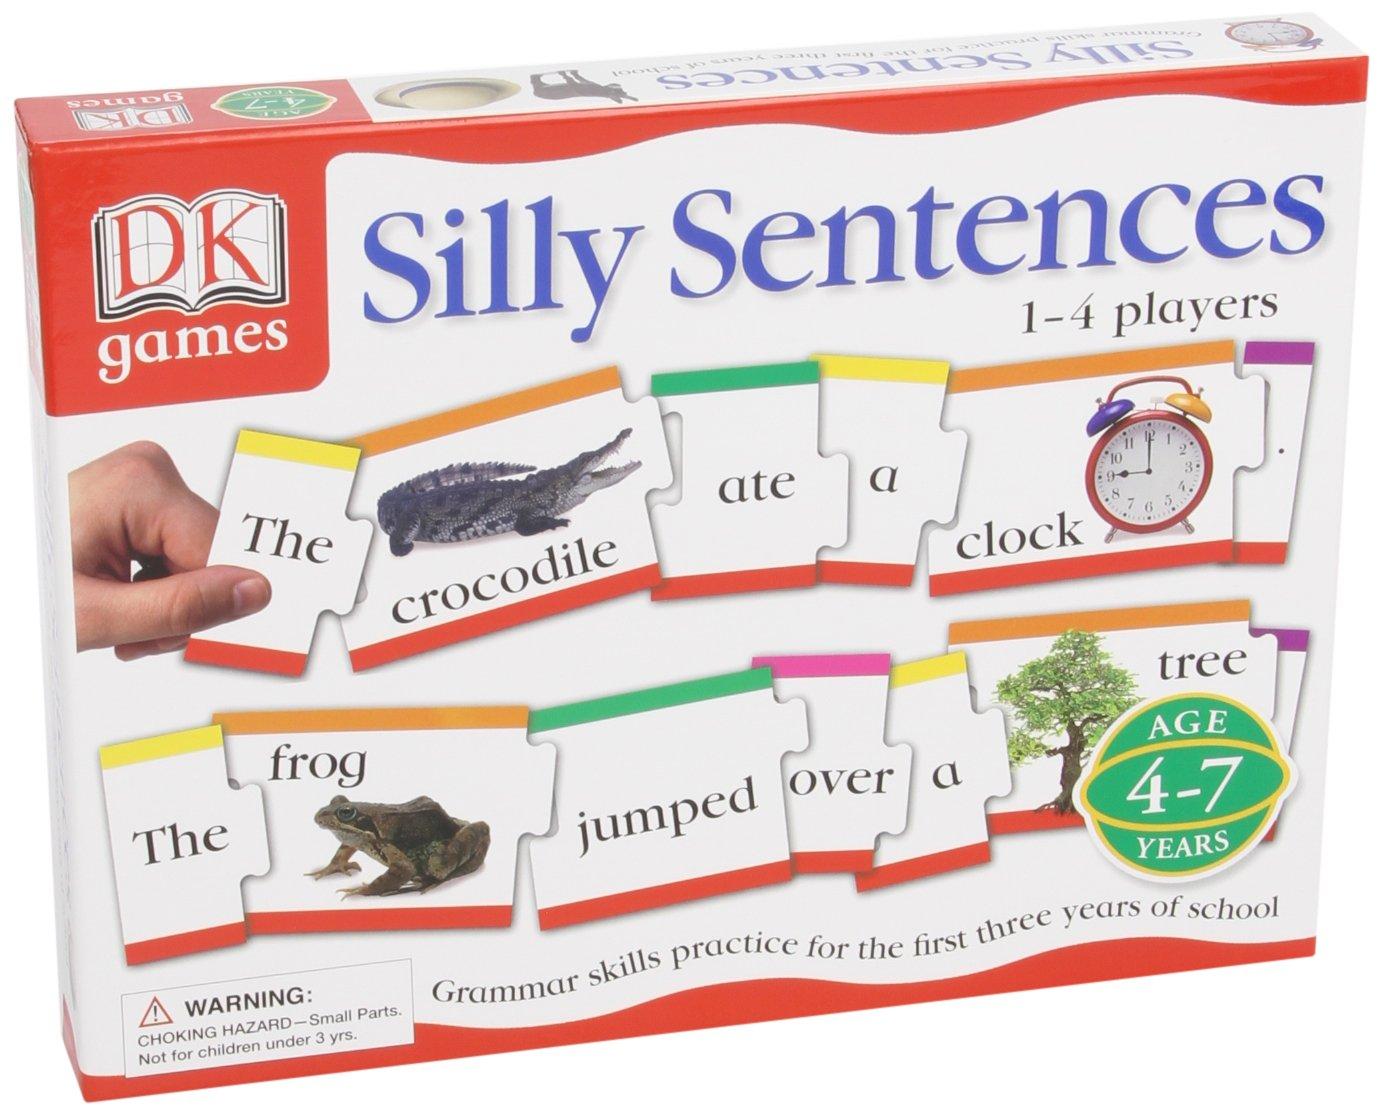 DK Games Silly Sentences